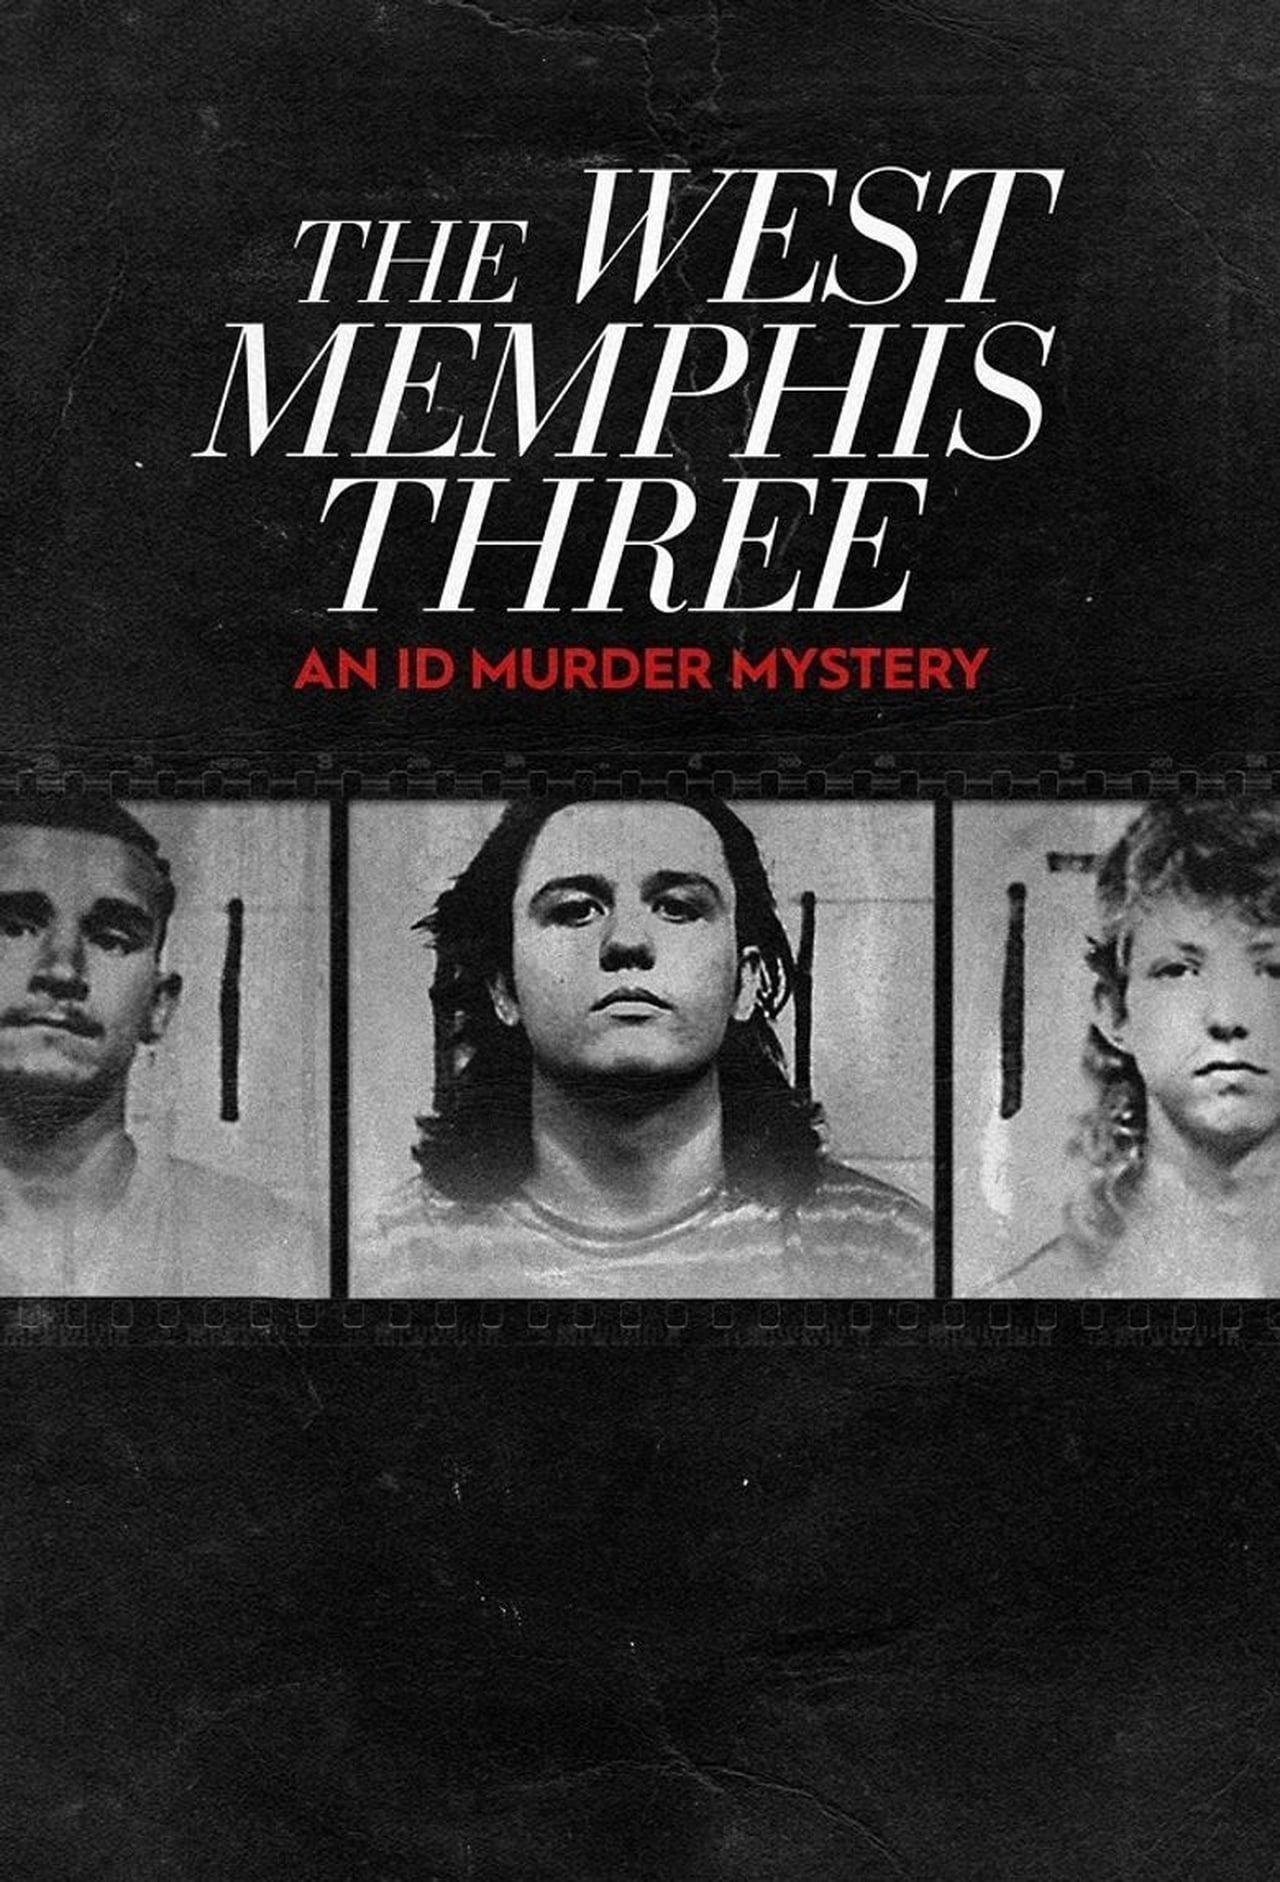 The West Memphis Three